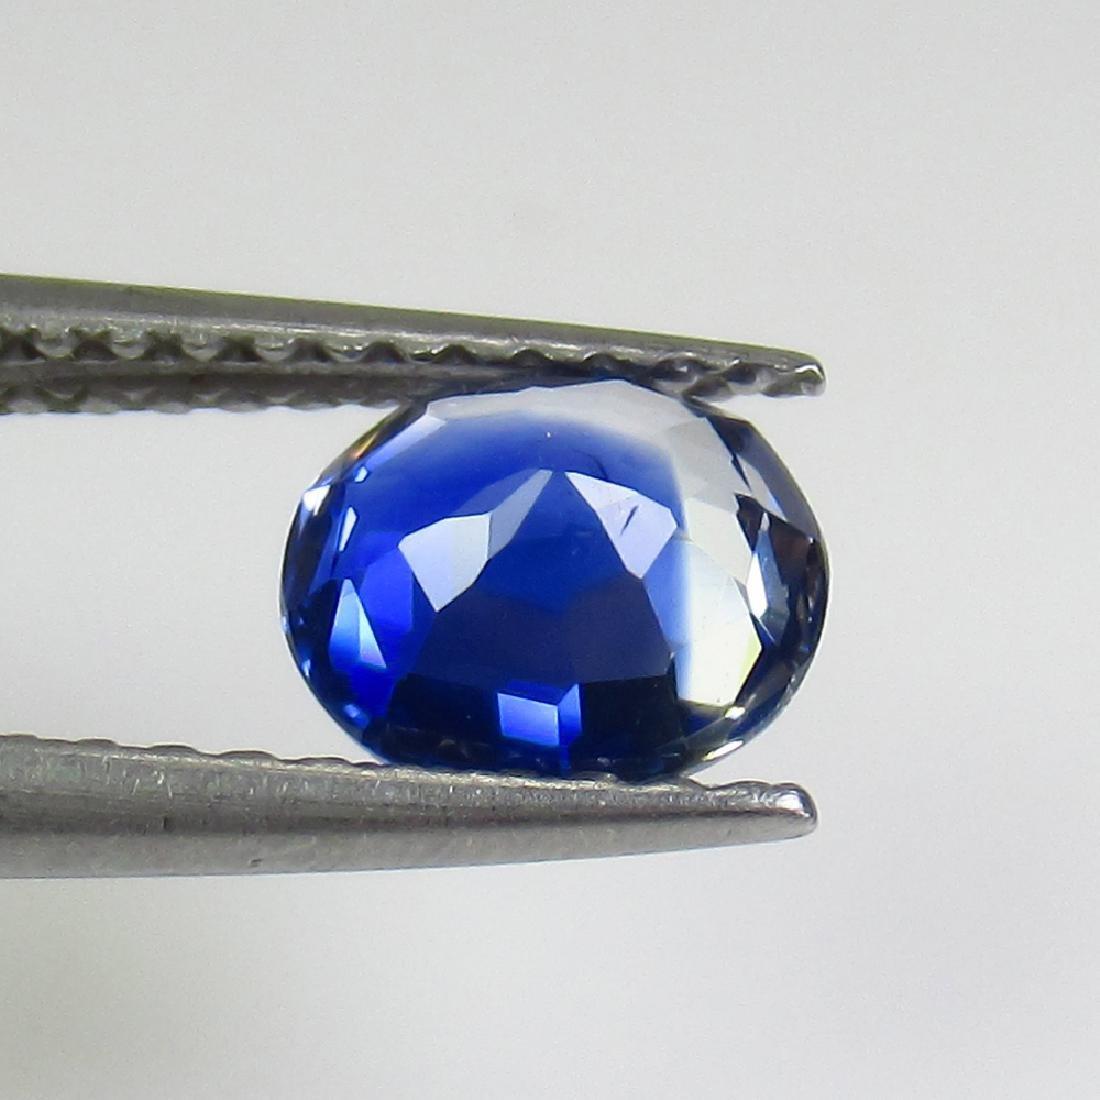 1.11 Ct Genuine Ceylon Deep Blue Sapphire Oval Cut - 2